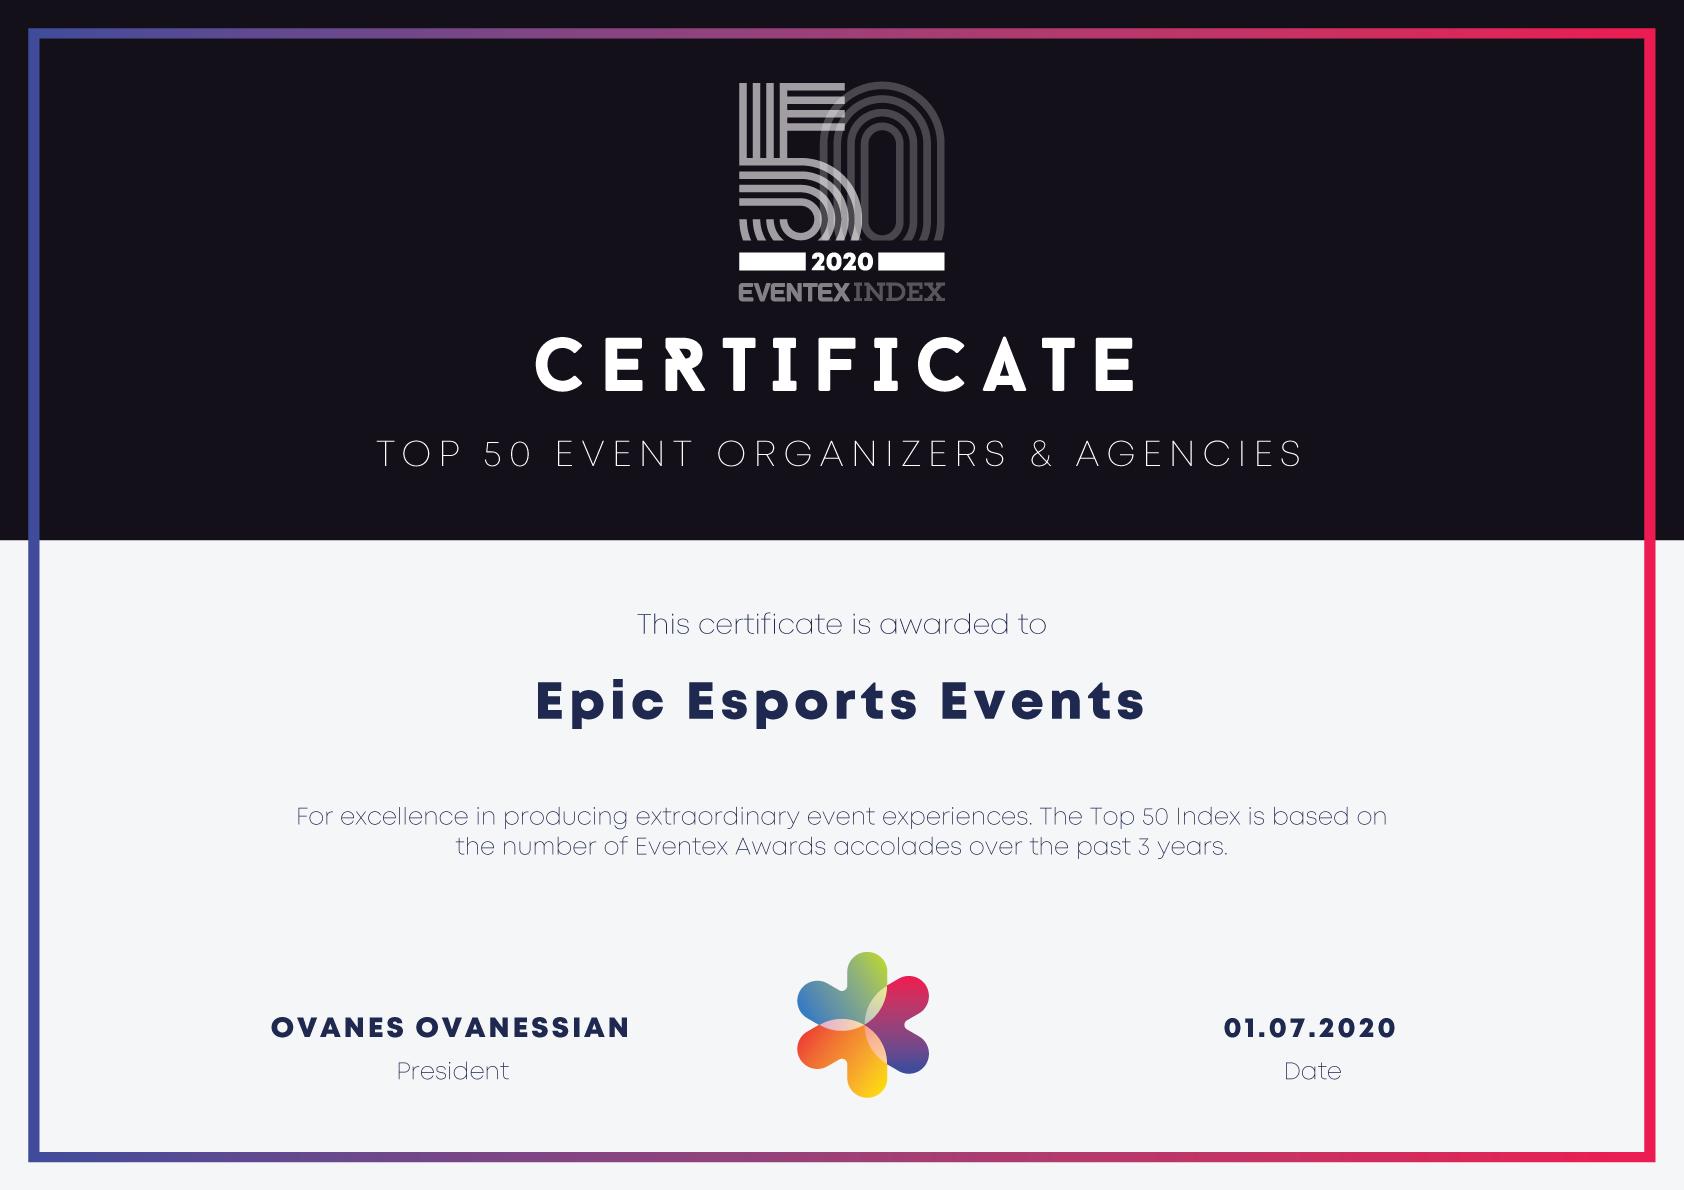 Epic Esports Events занял 15 место среди 50 лучших ивент-компаний мира по версии Eventex